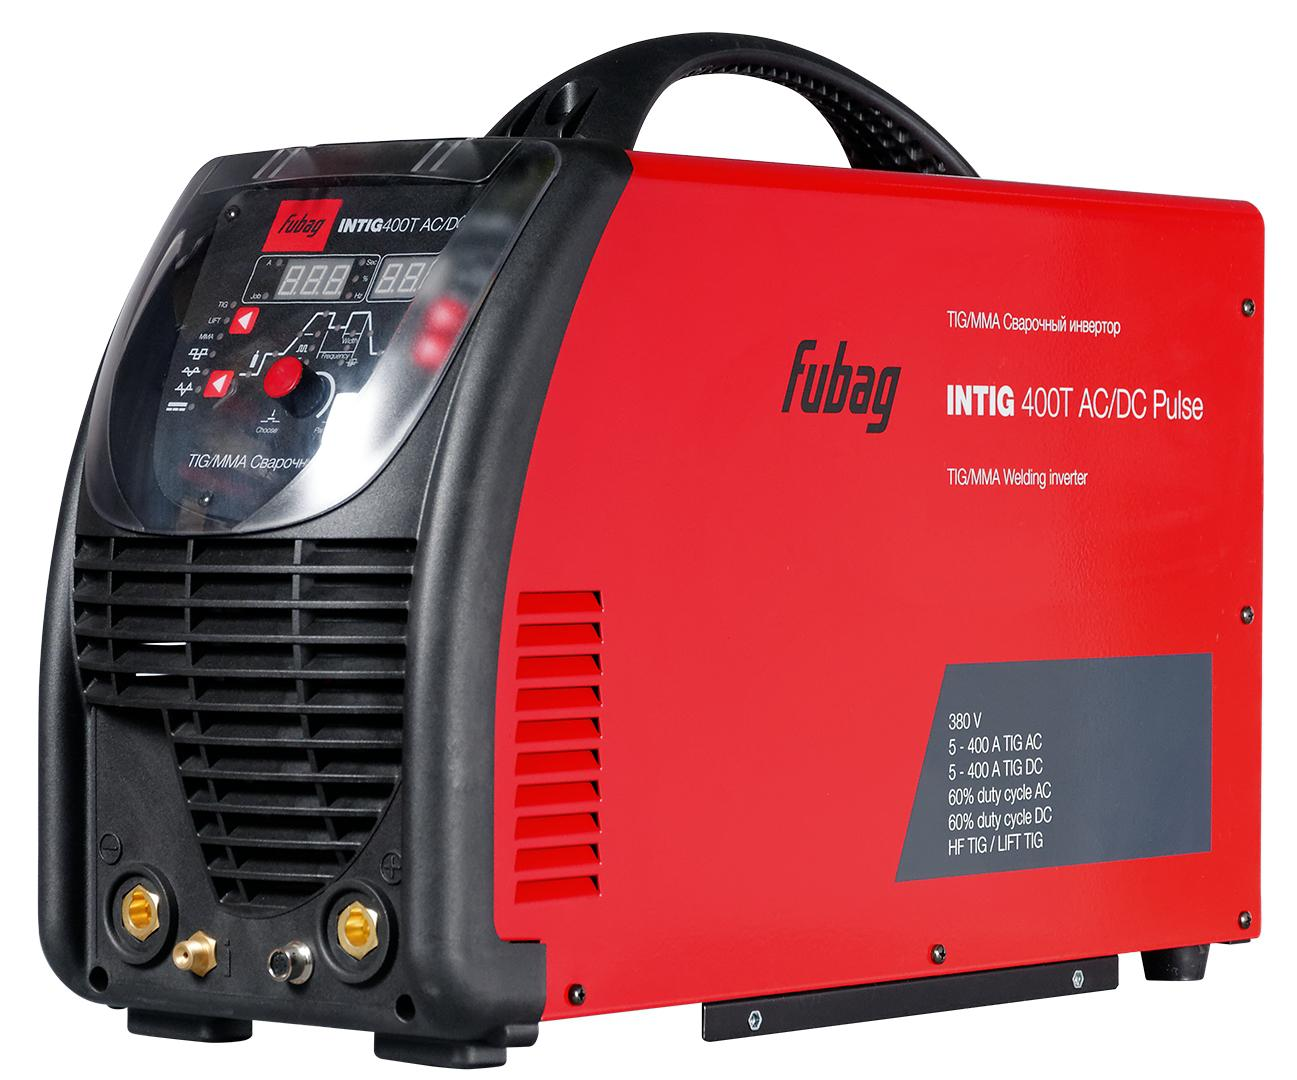 Инвертор Fubag Intig 400 t ac/dc pulse инвертор сварочный fubag intig 200 dc pulse